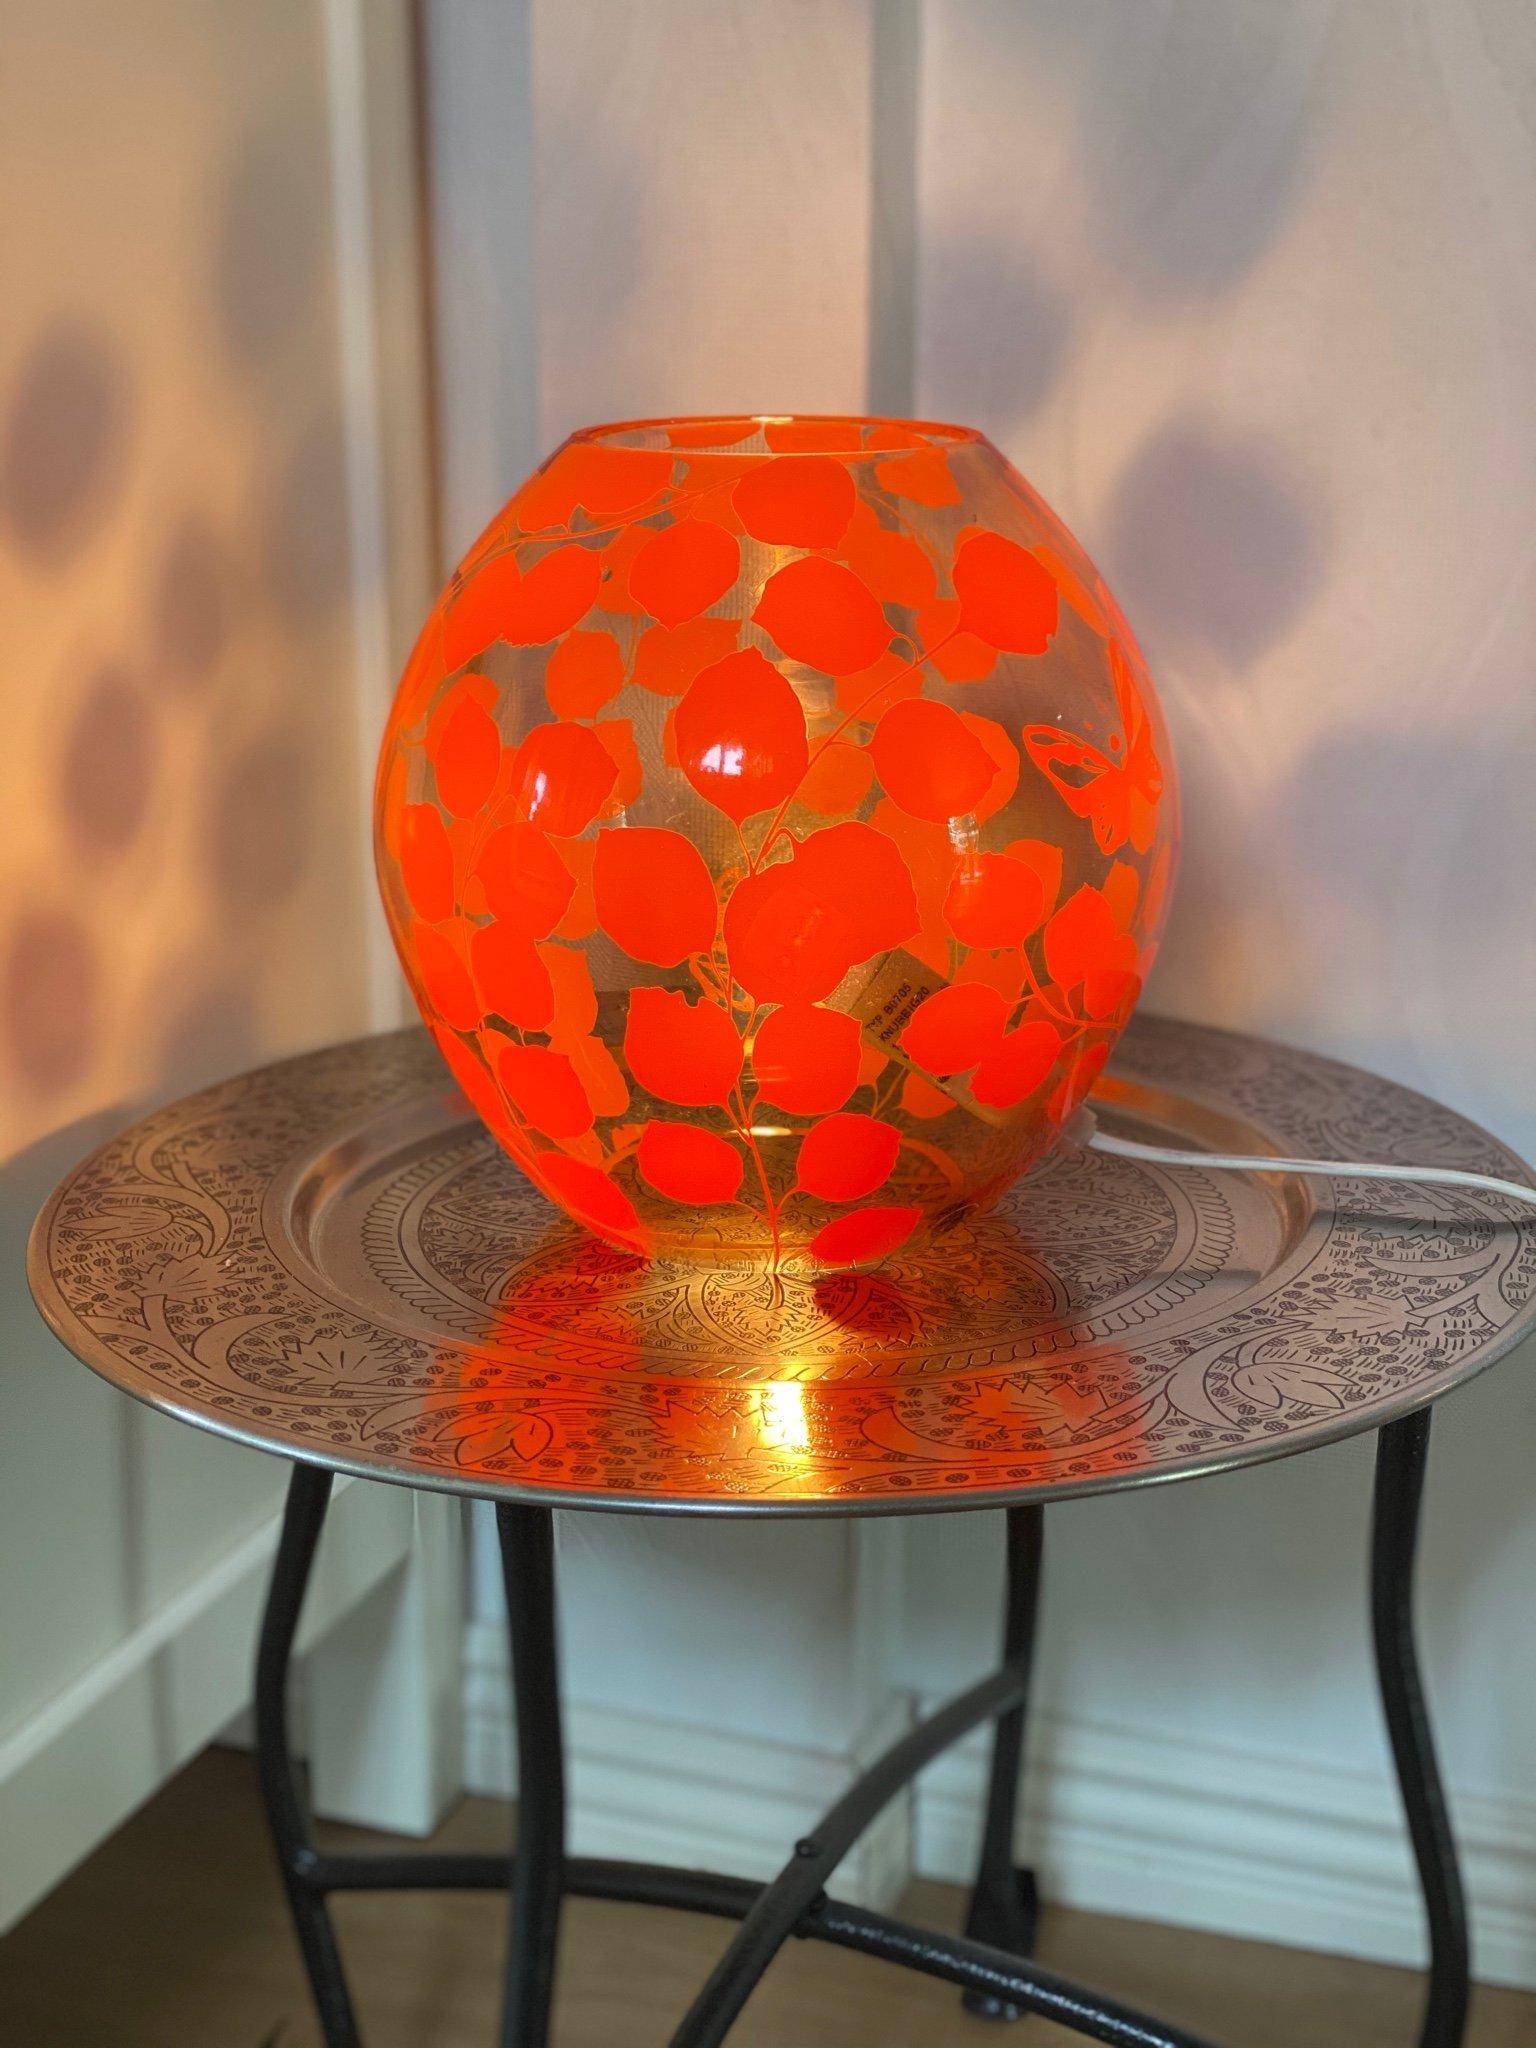 Ikea knubbig bordslampa fönsterlampa lampa retro stil orange glas boll